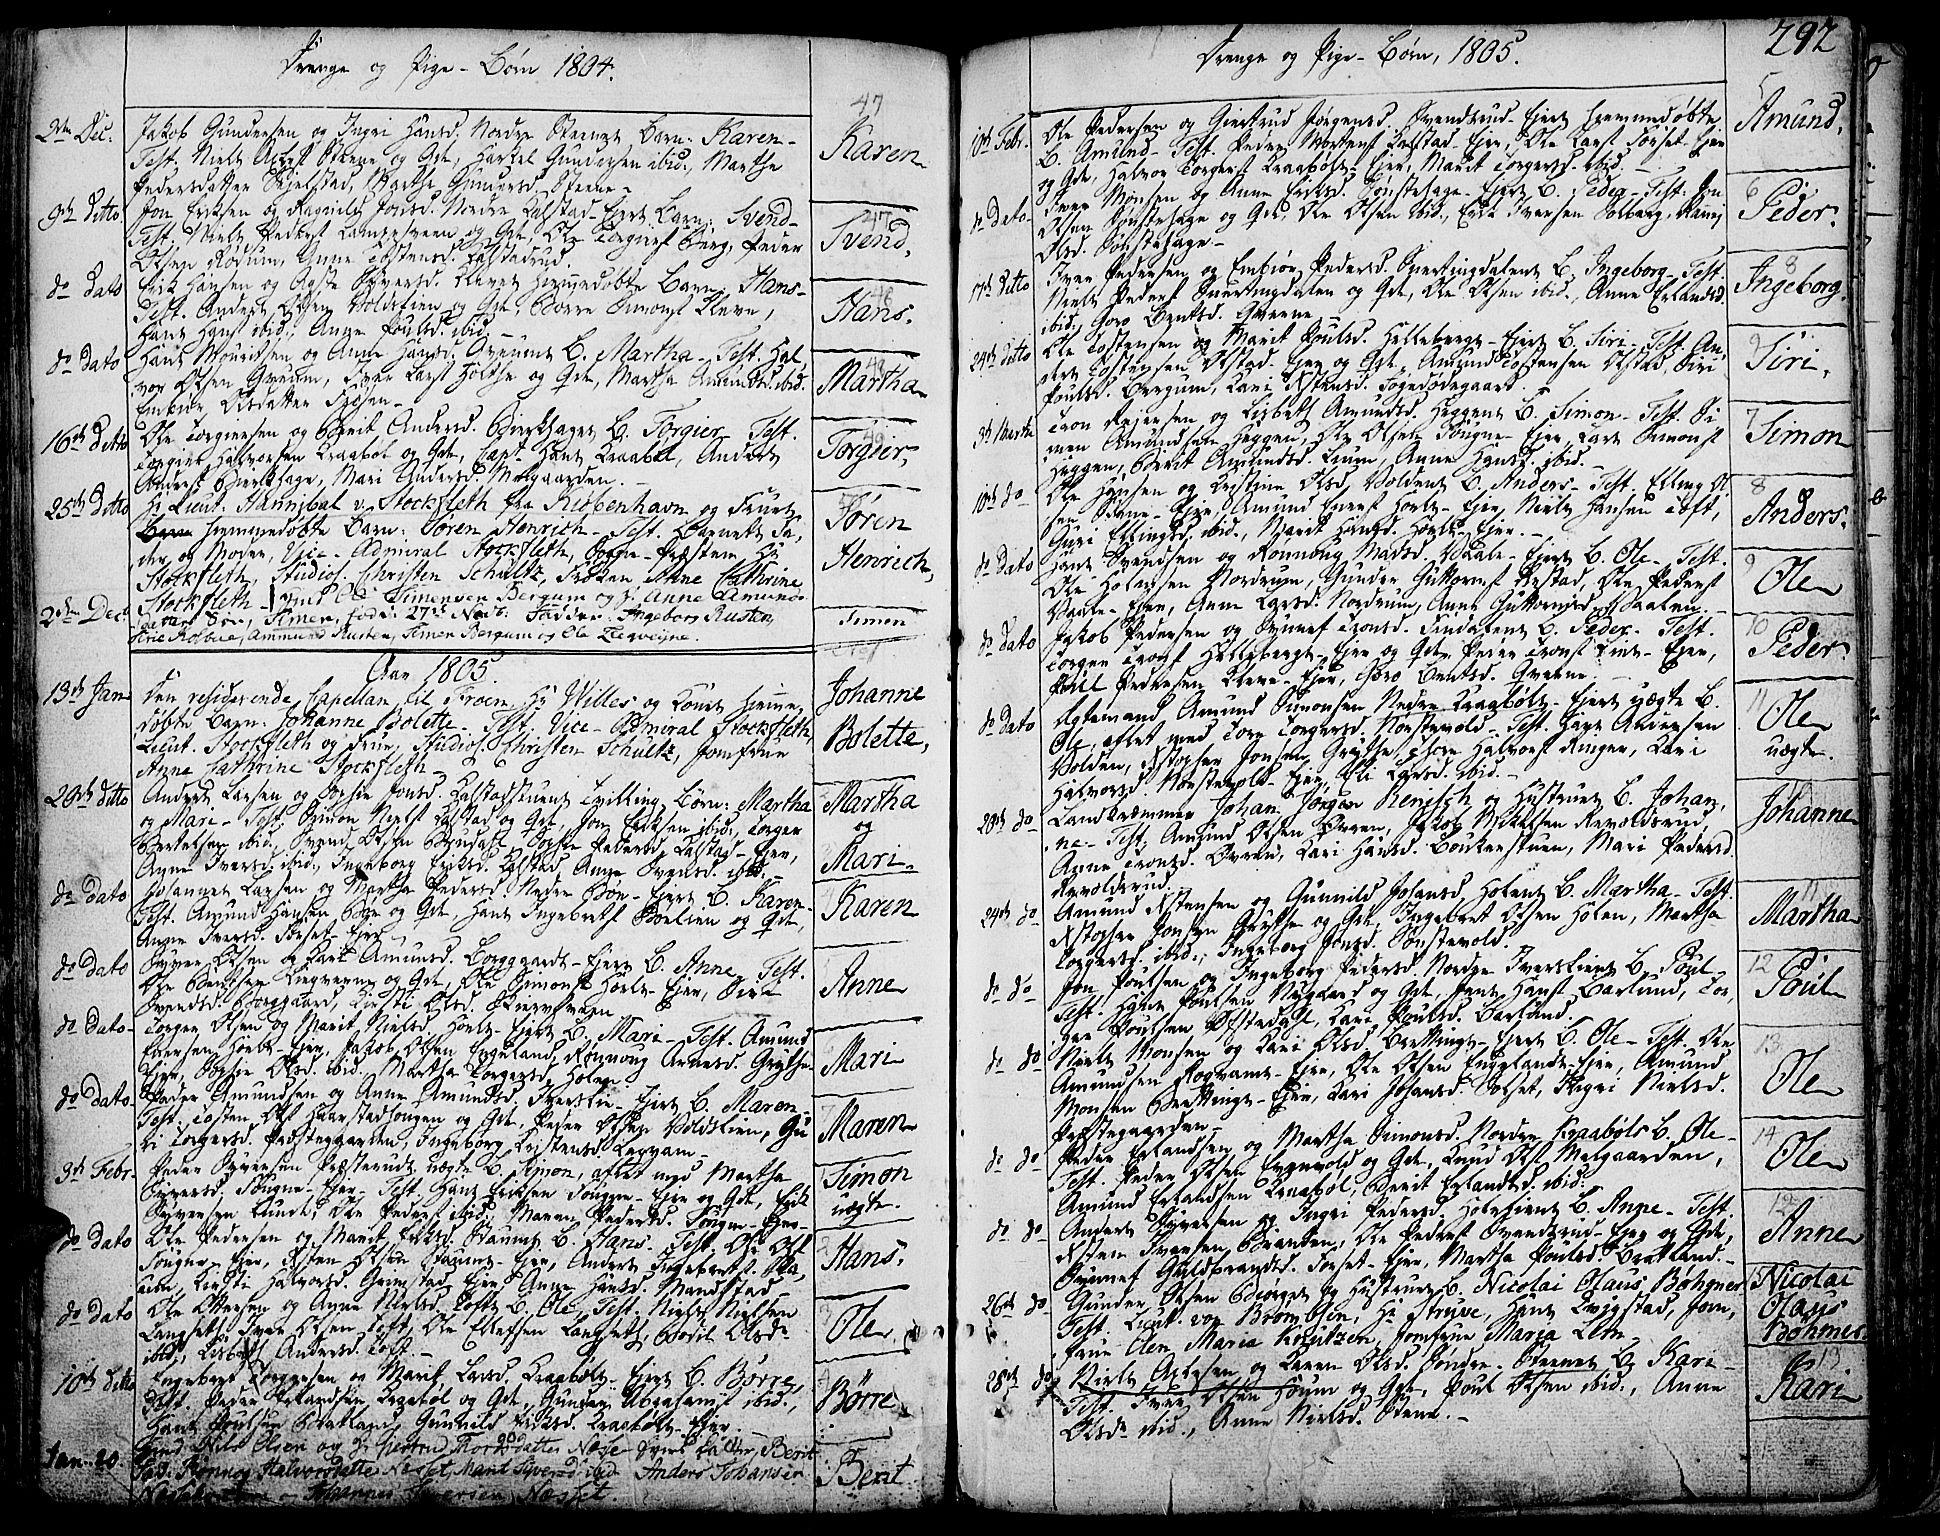 SAH, Gausdal prestekontor, Ministerialbok nr. 3, 1758-1809, s. 292